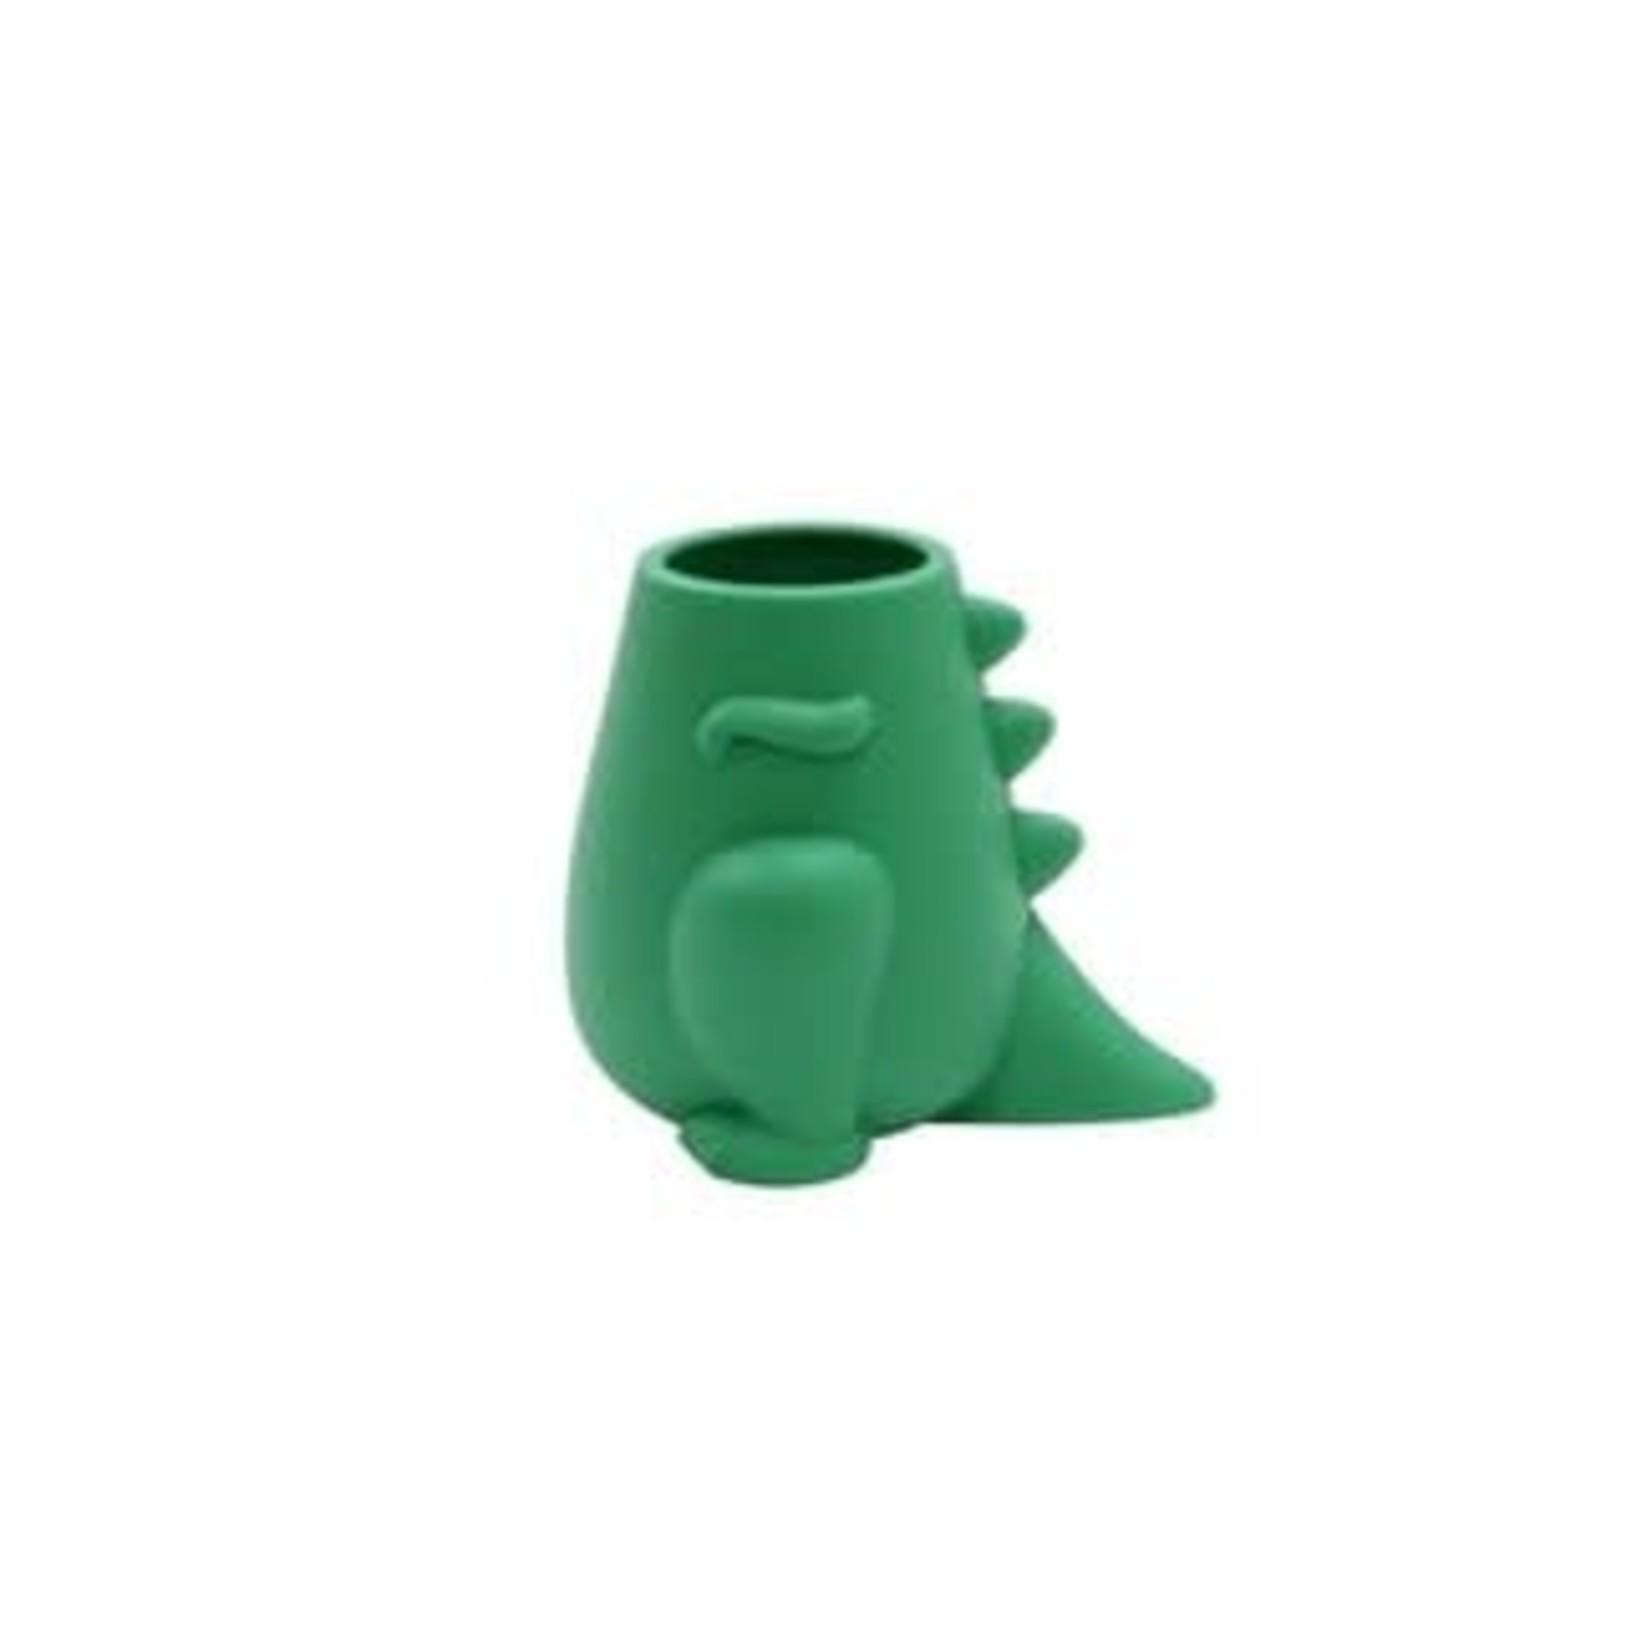 Kids' Toothbrush Holder Dino Green - Pillowfort